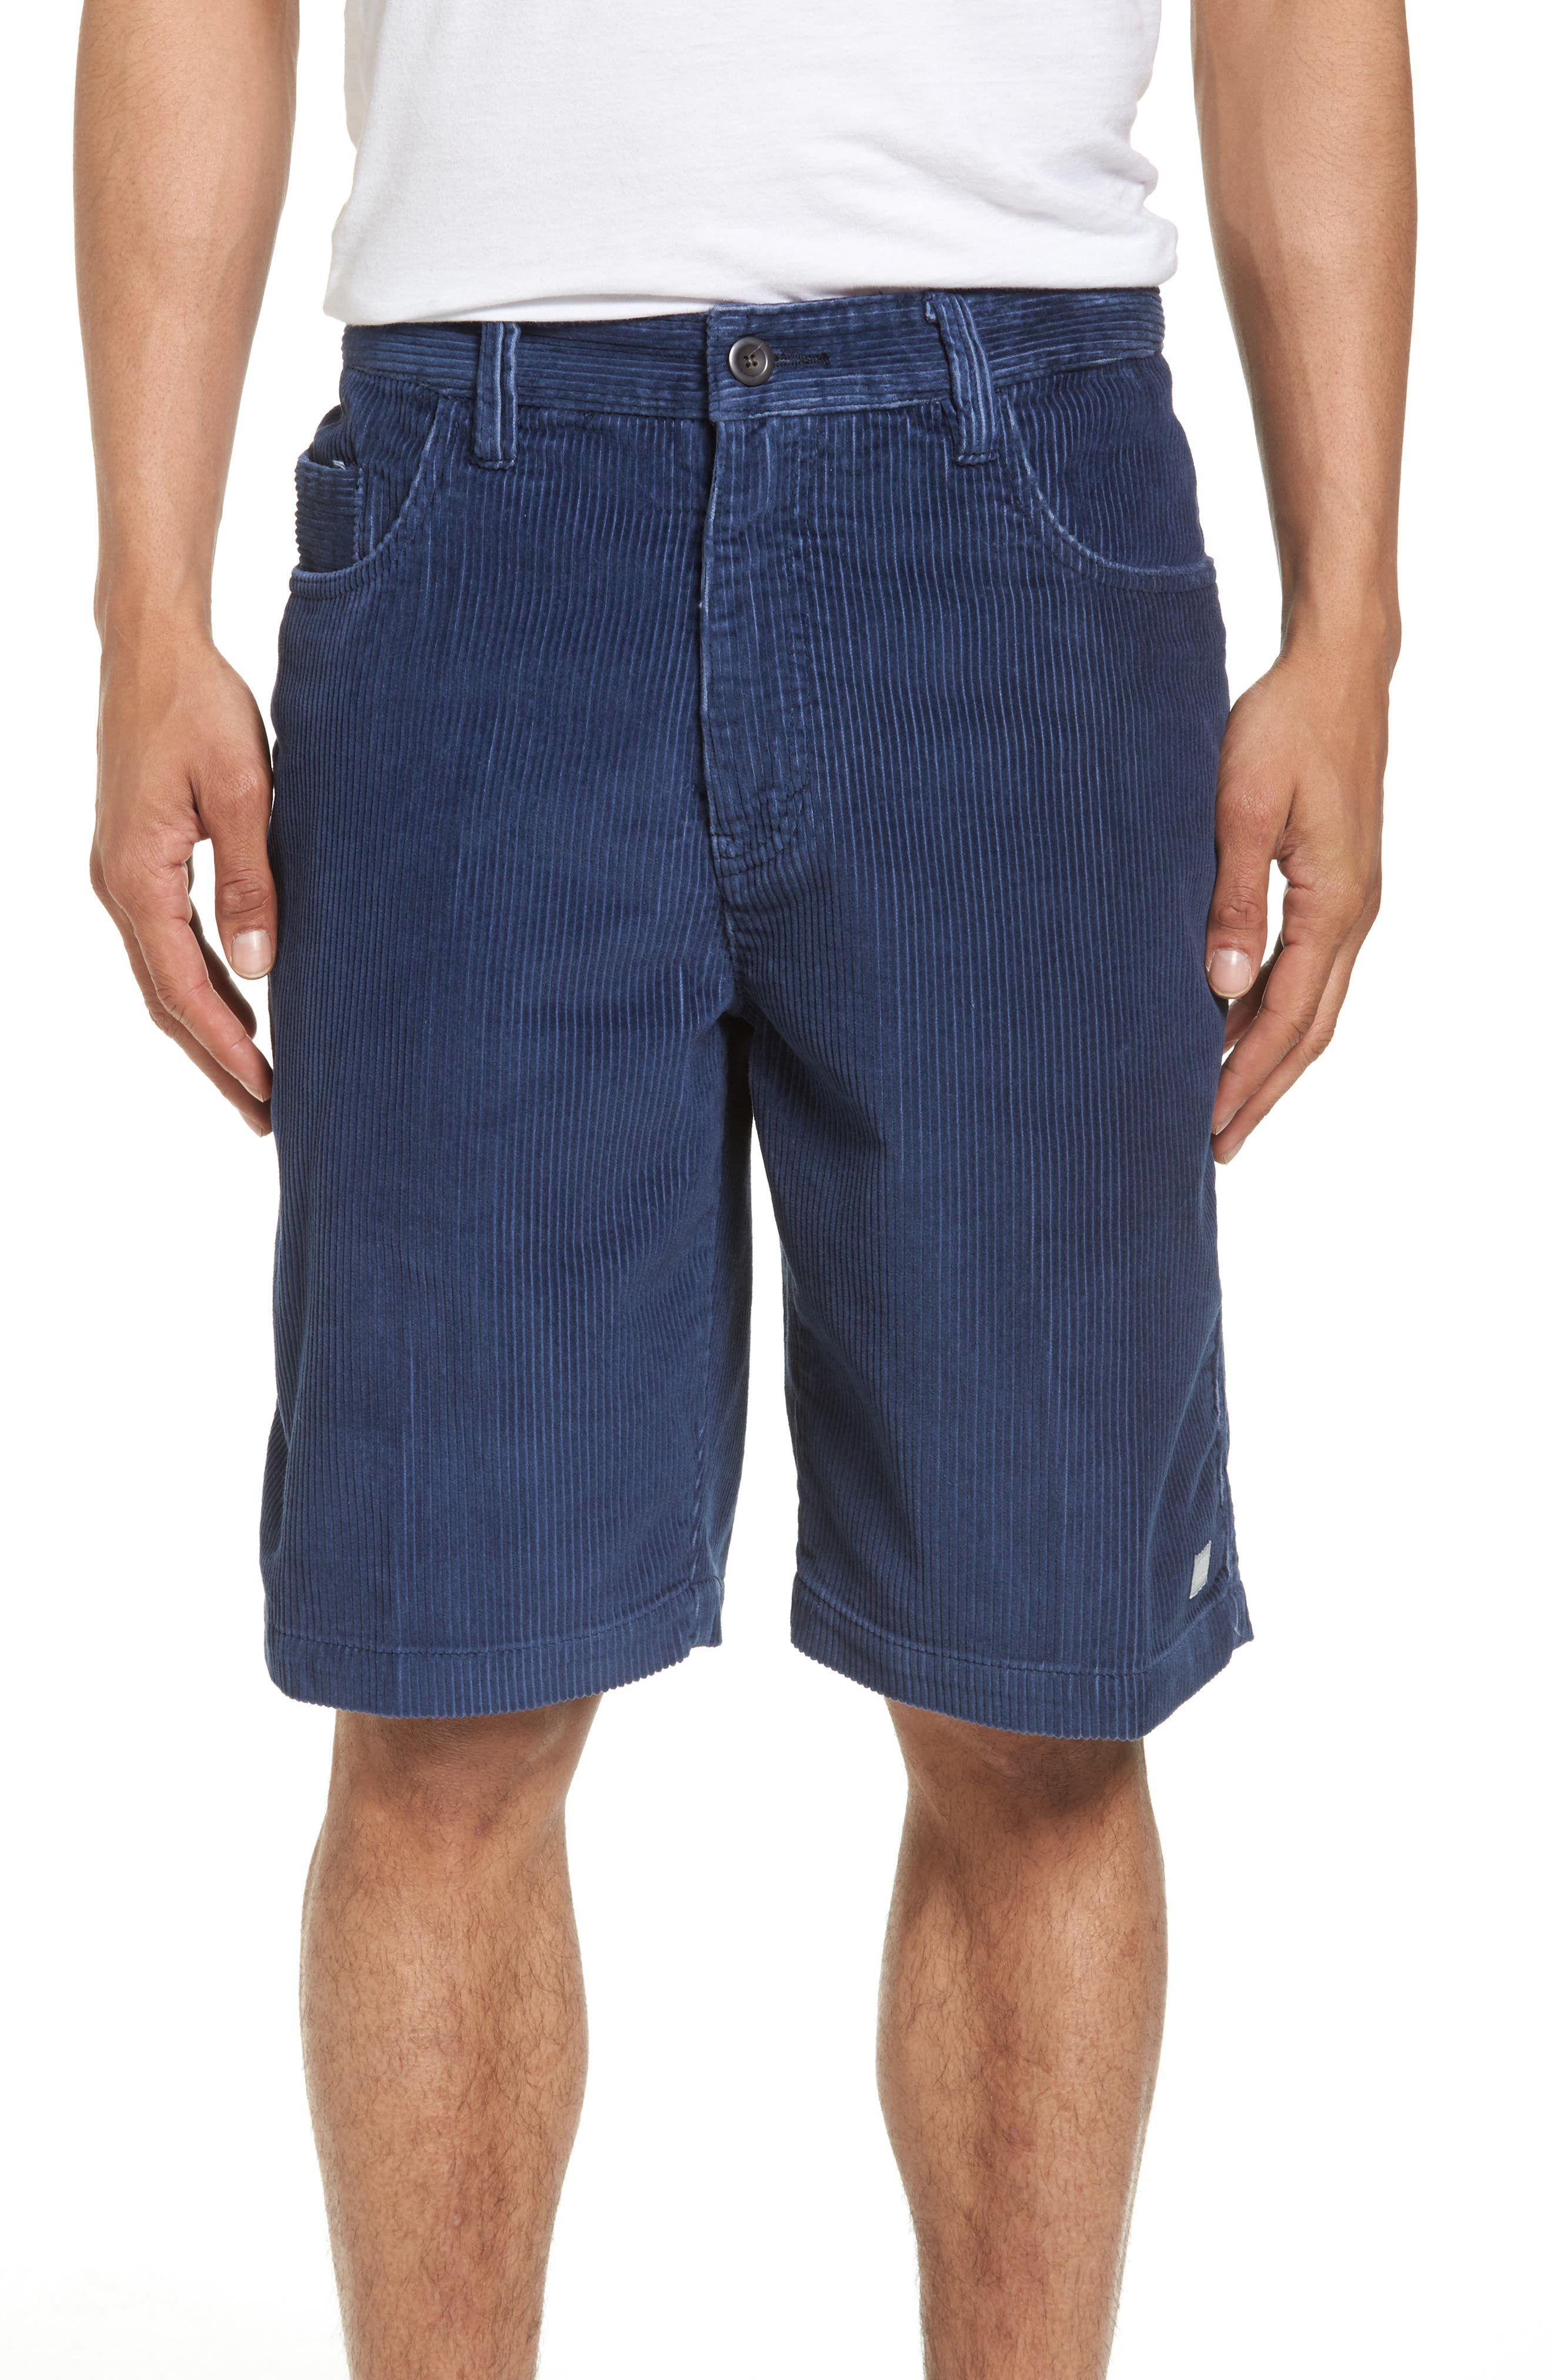 Kordo Corduroy Walking Shorts,                             Main thumbnail 1, color,                             410